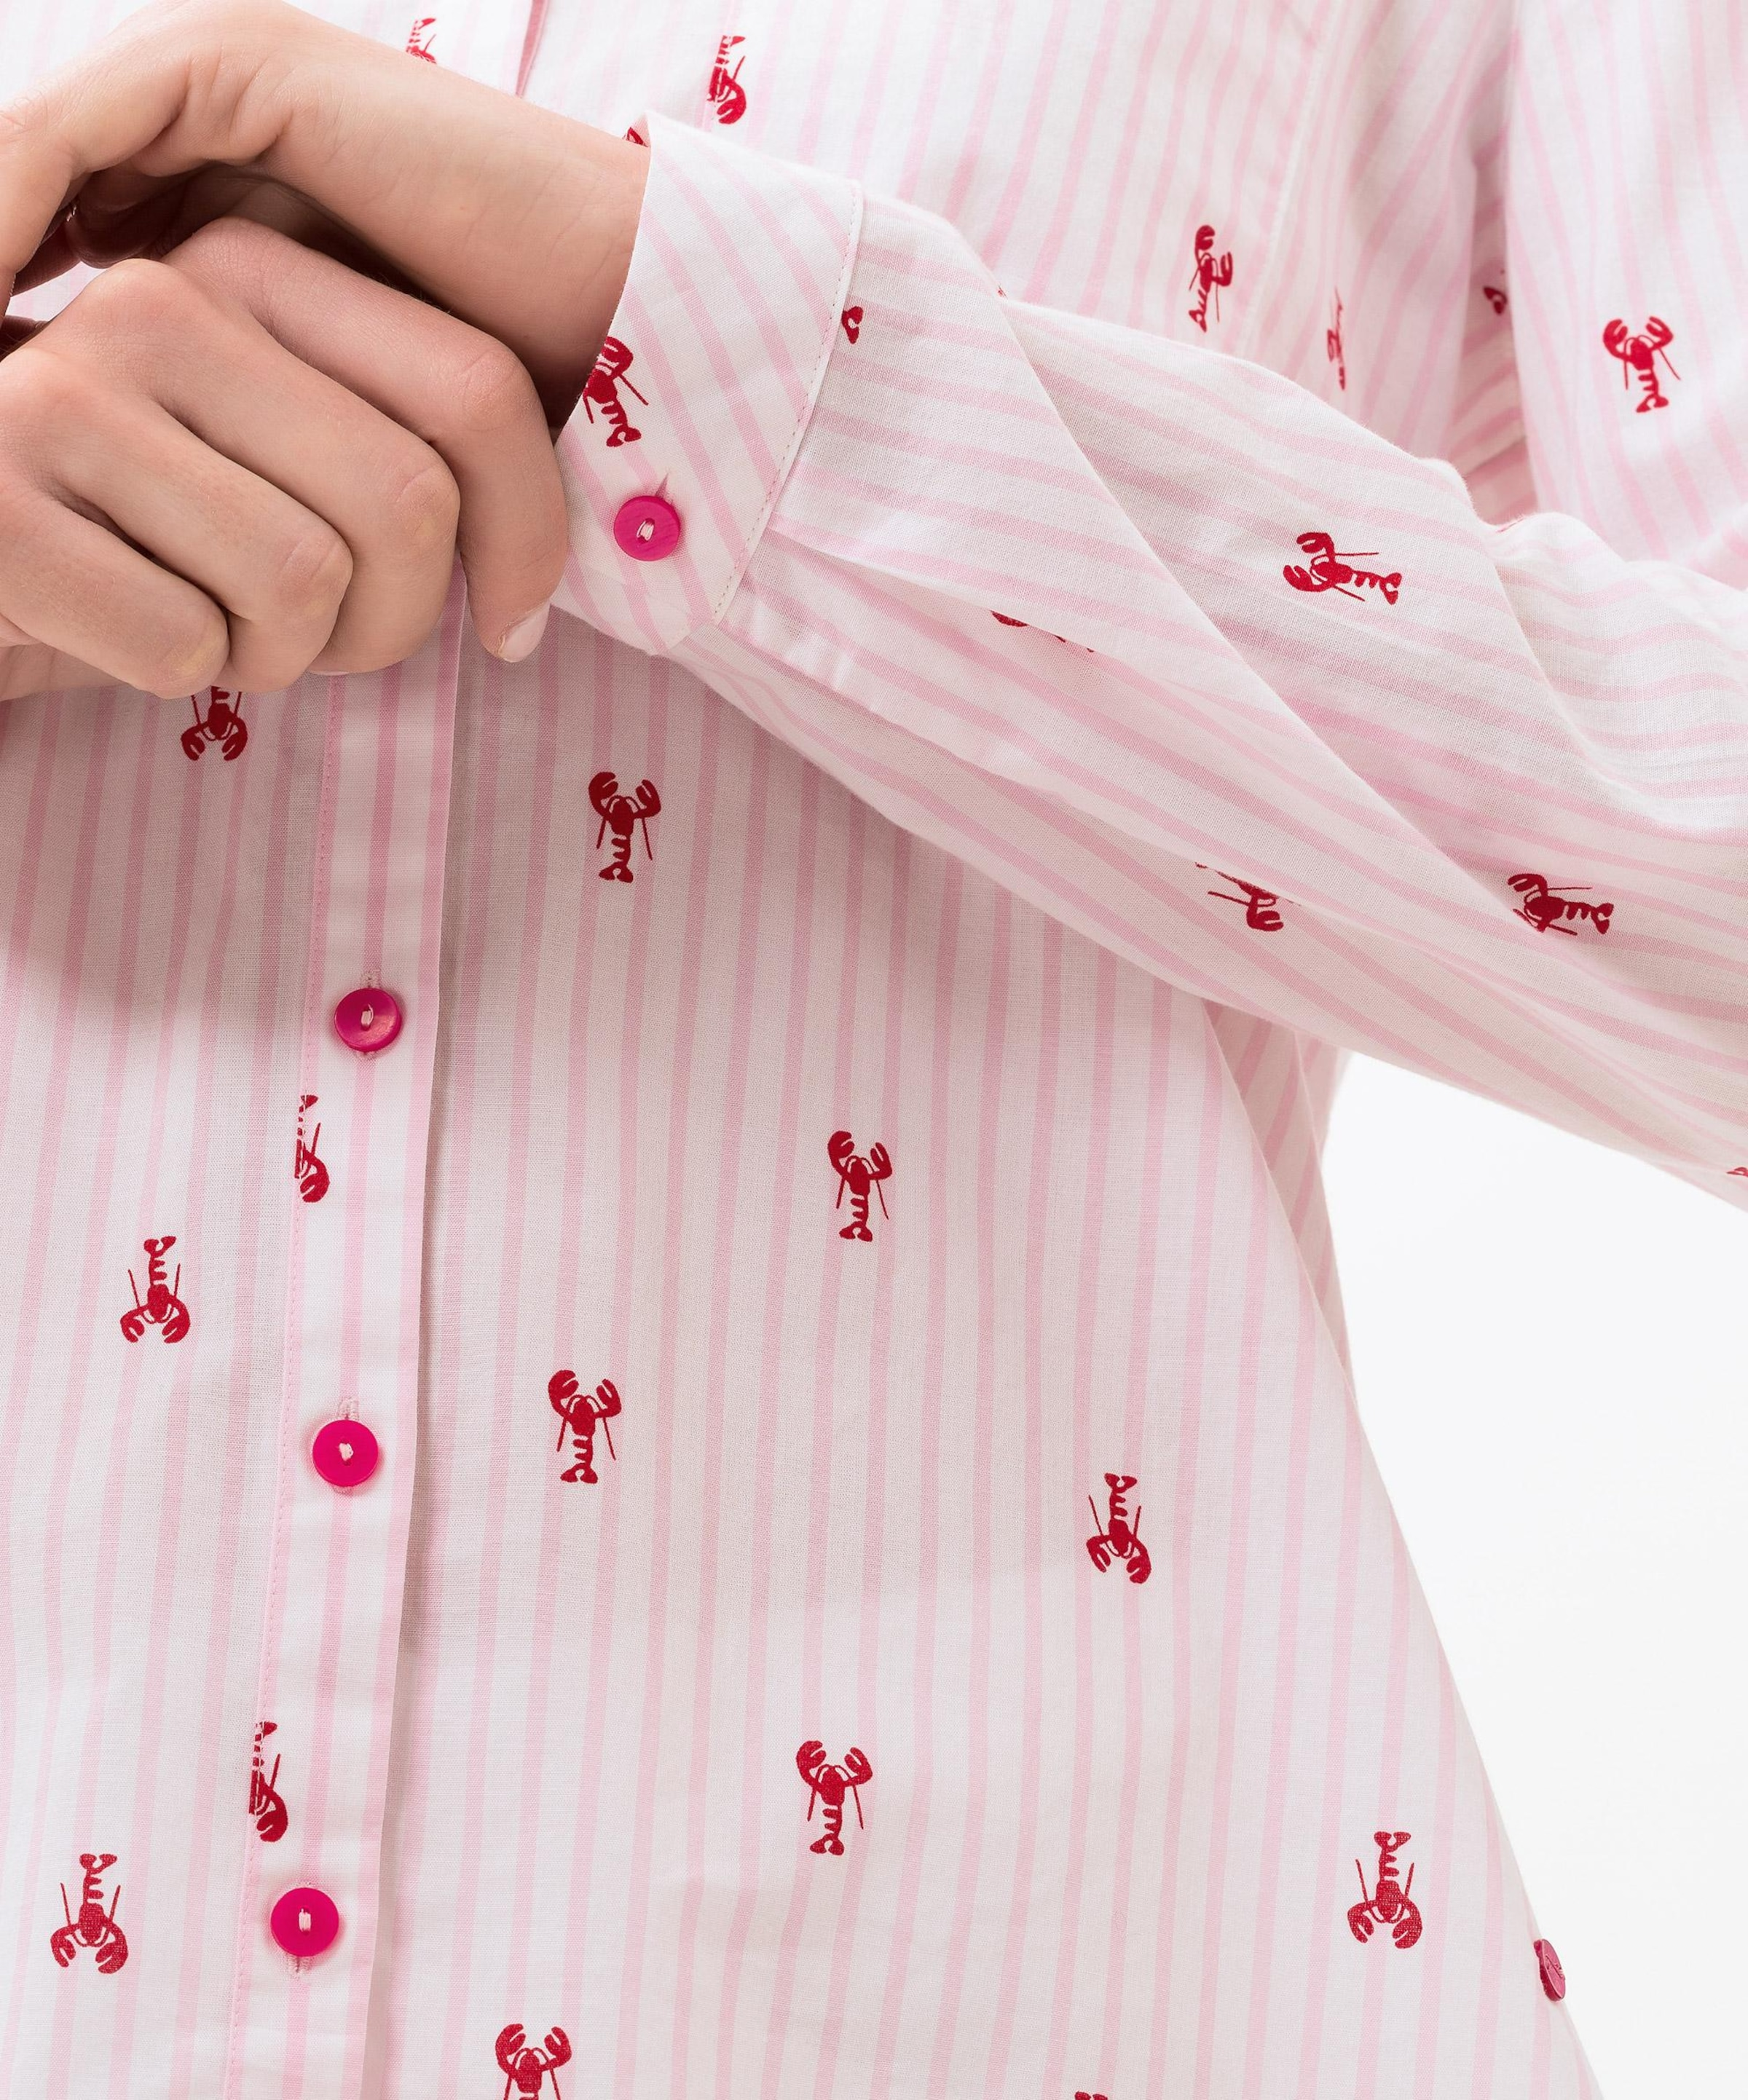 Weiß Bluse In Brax 'velia' RosaCranberry y0nNwOmv8P